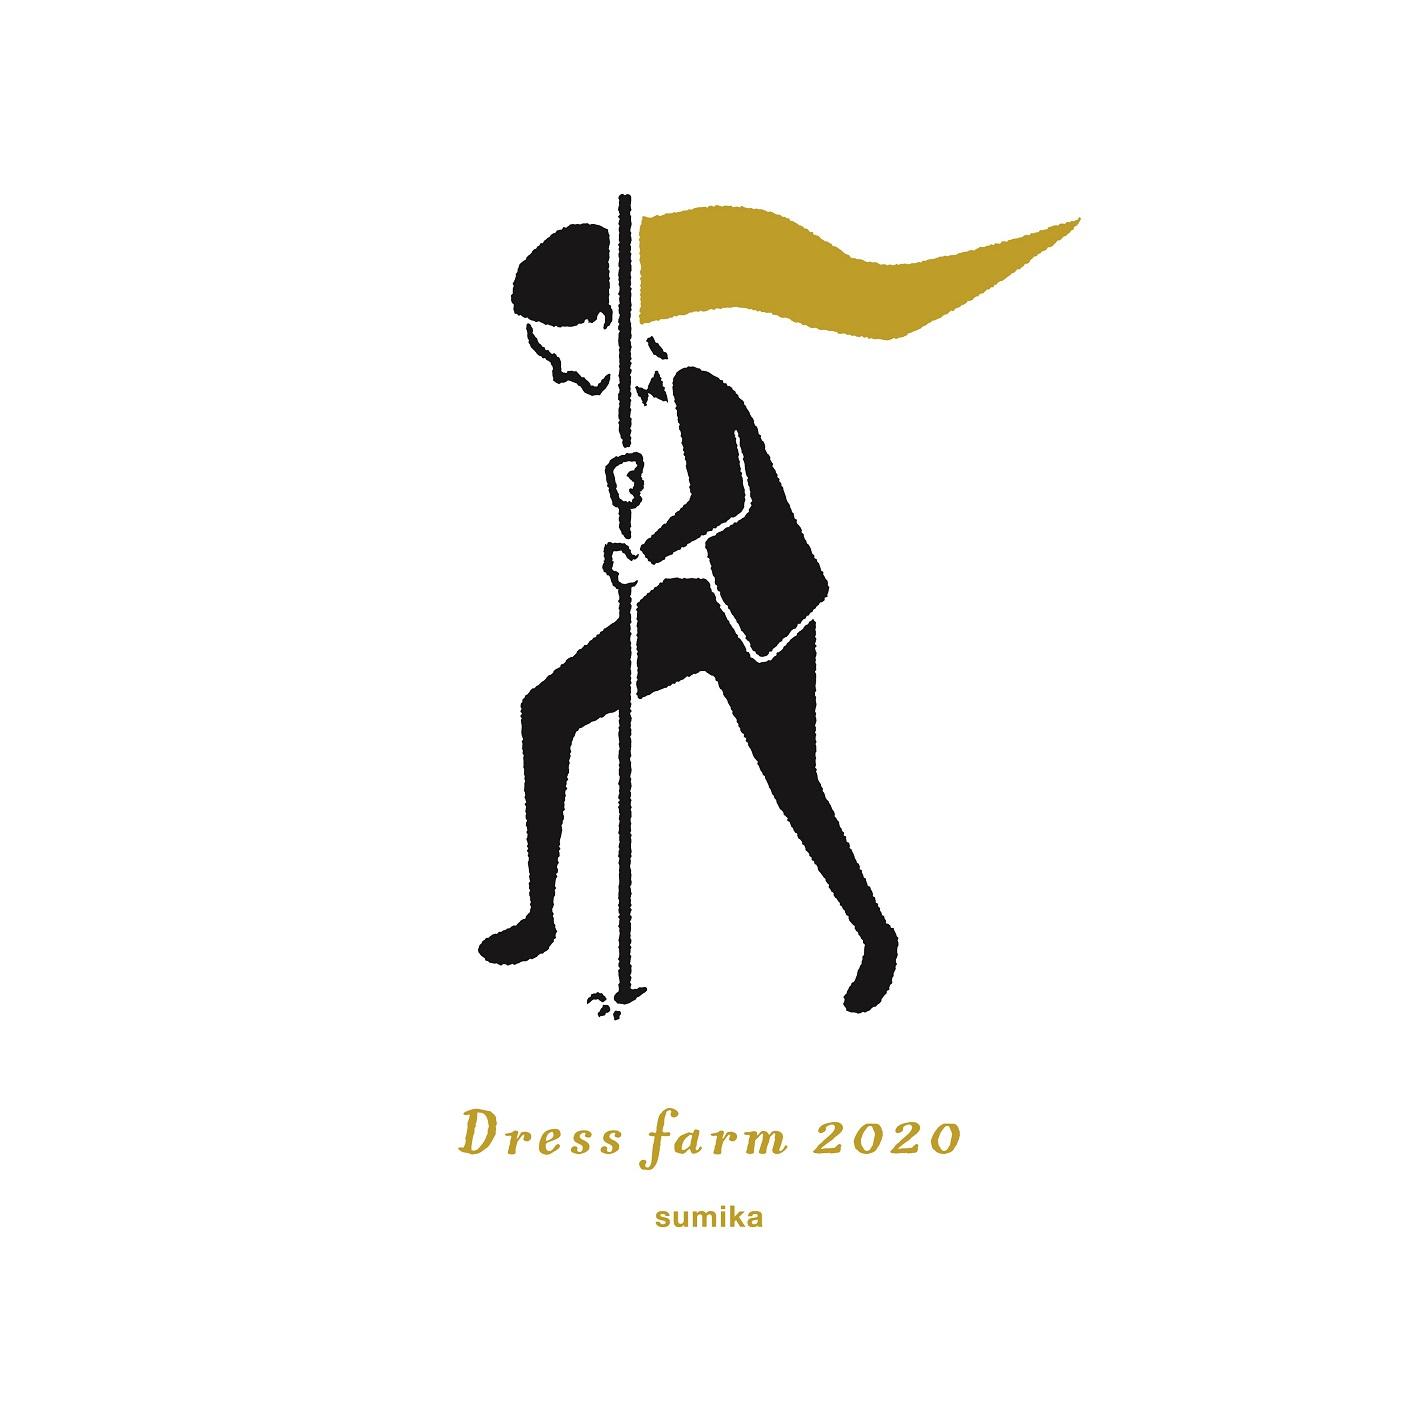 "sumika、リモートレコーディングされた新曲4曲を公開~医療やエンタメ従事者対象の基金""Dress farm 2020""も創設!"